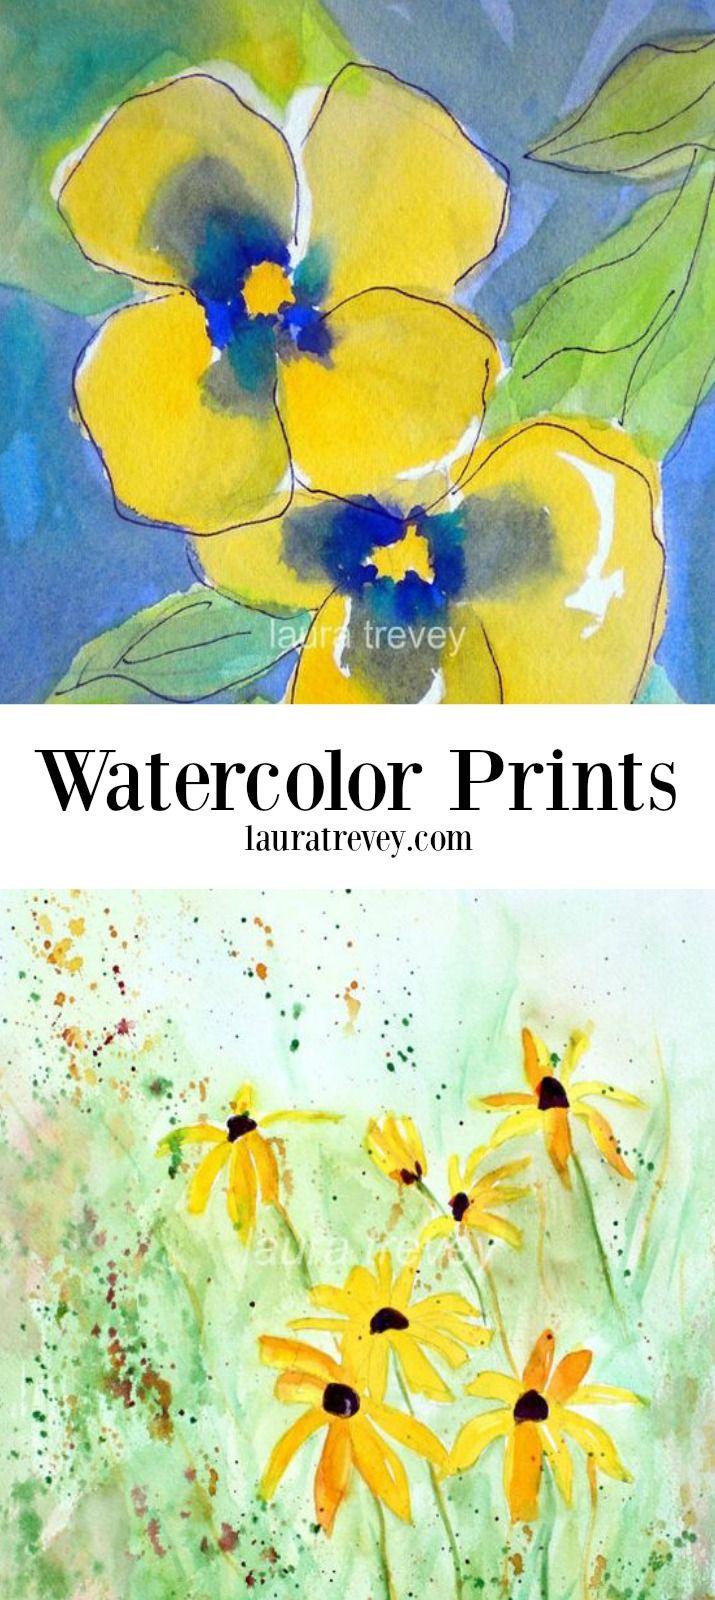 Watercolor artist magazine palm coast fl - 15 Art Prints On Sale For Five Dollars Each